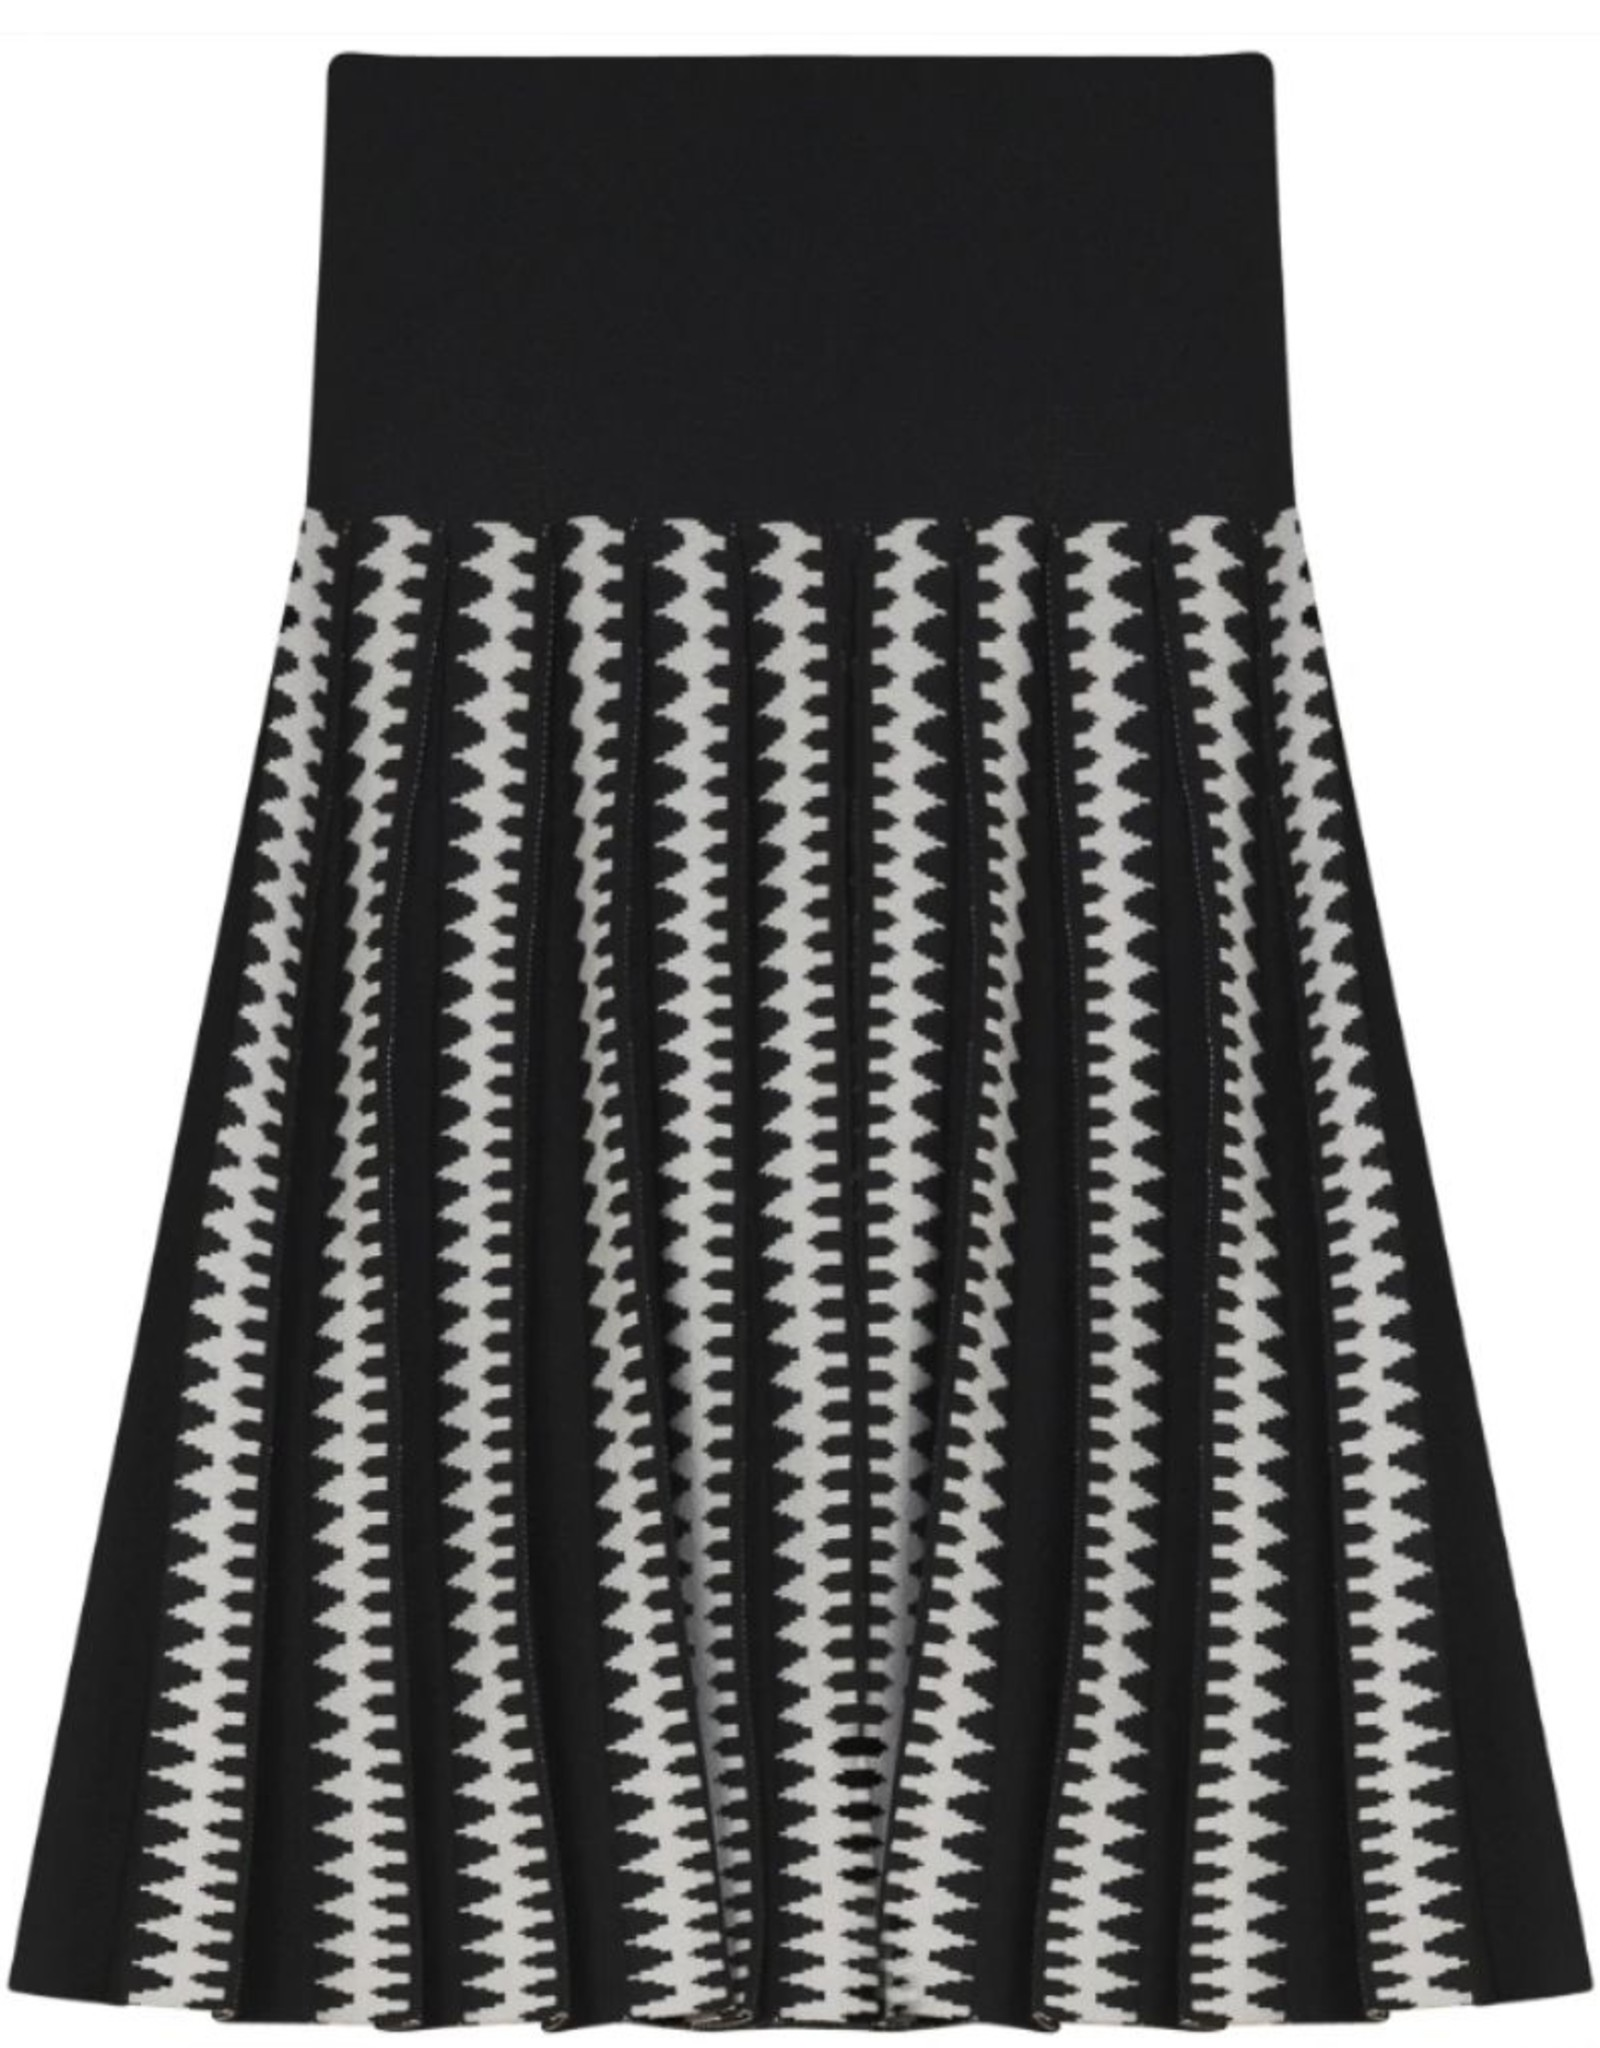 Noni Noni Patterned Pleated Knit Skirt